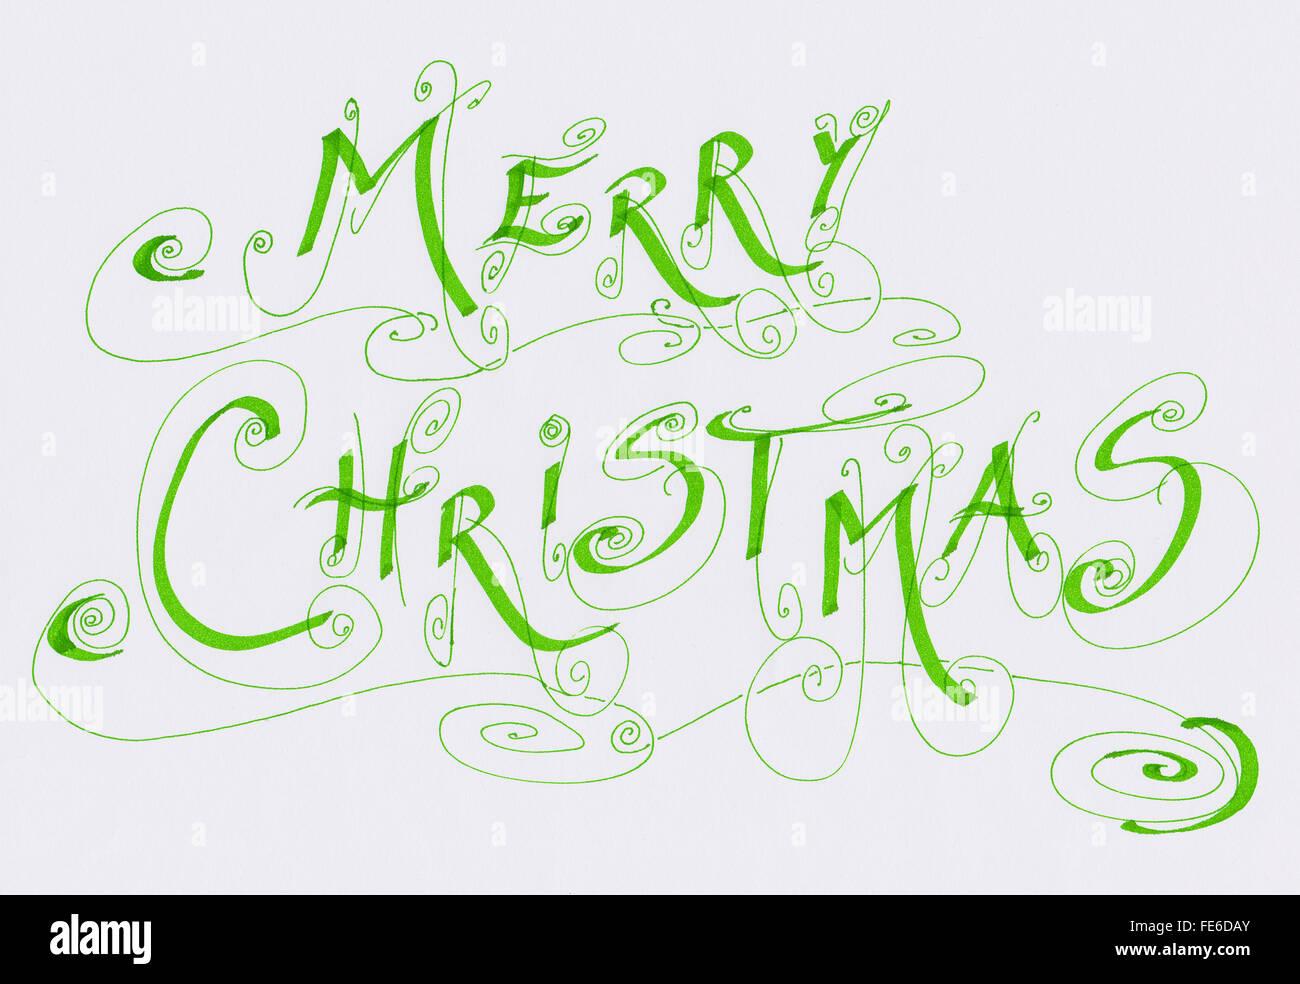 Merry Christmas Writing Images.Merry Christmas Calligraphic Writing Stock Photo 94799235